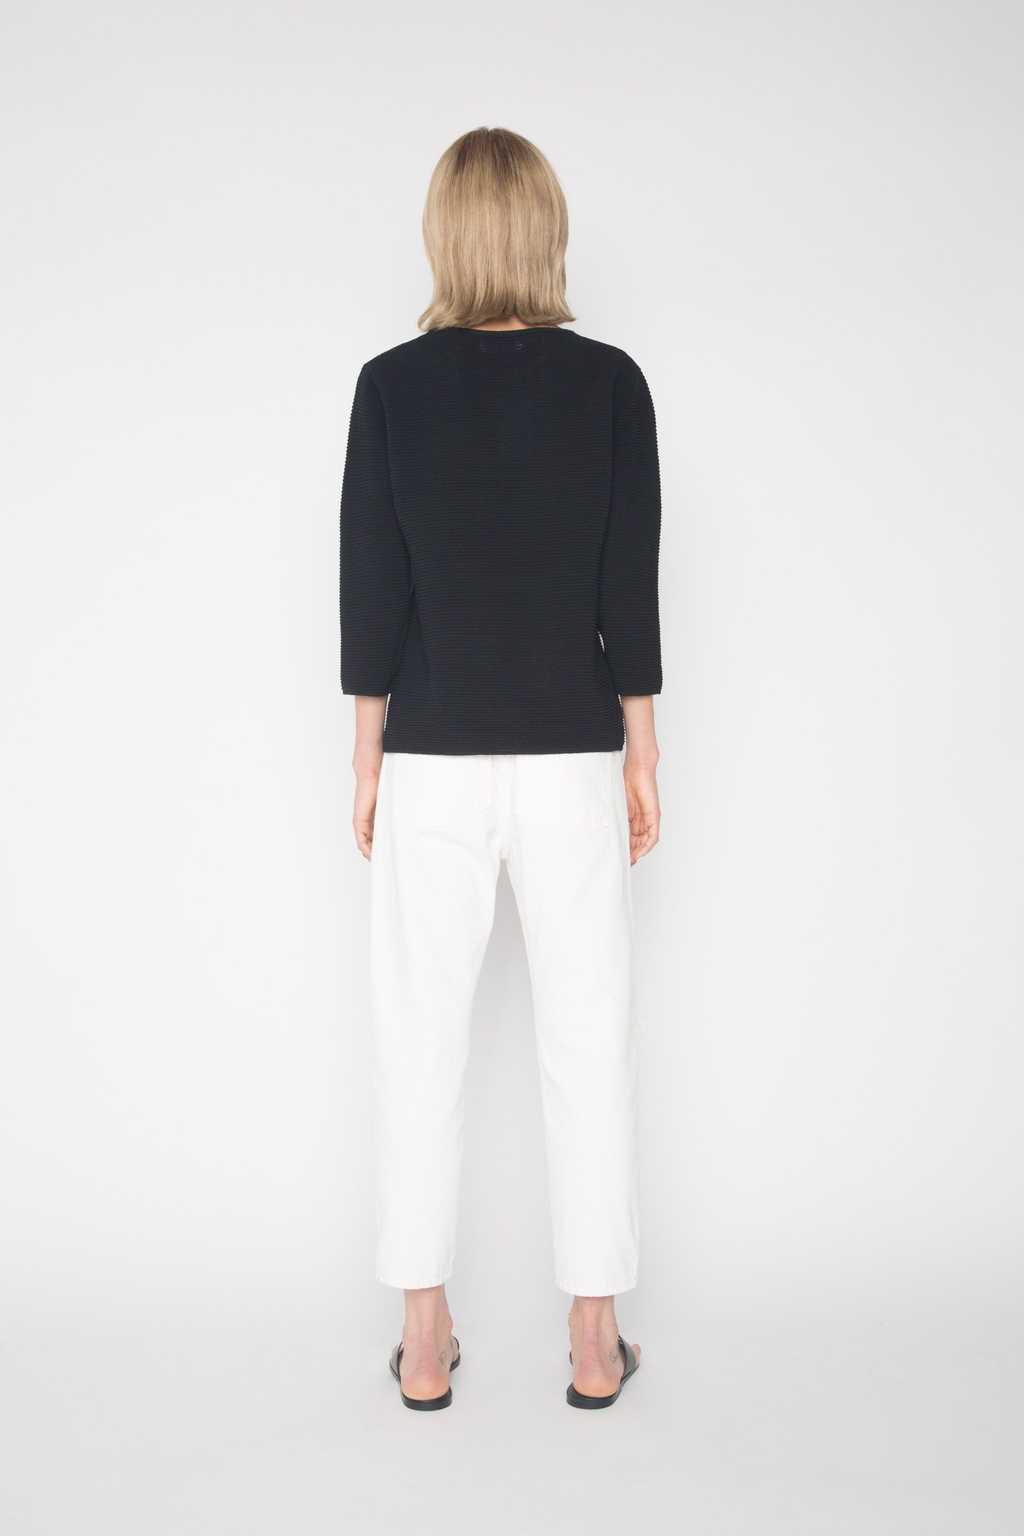 Sweater 1793 Black 3